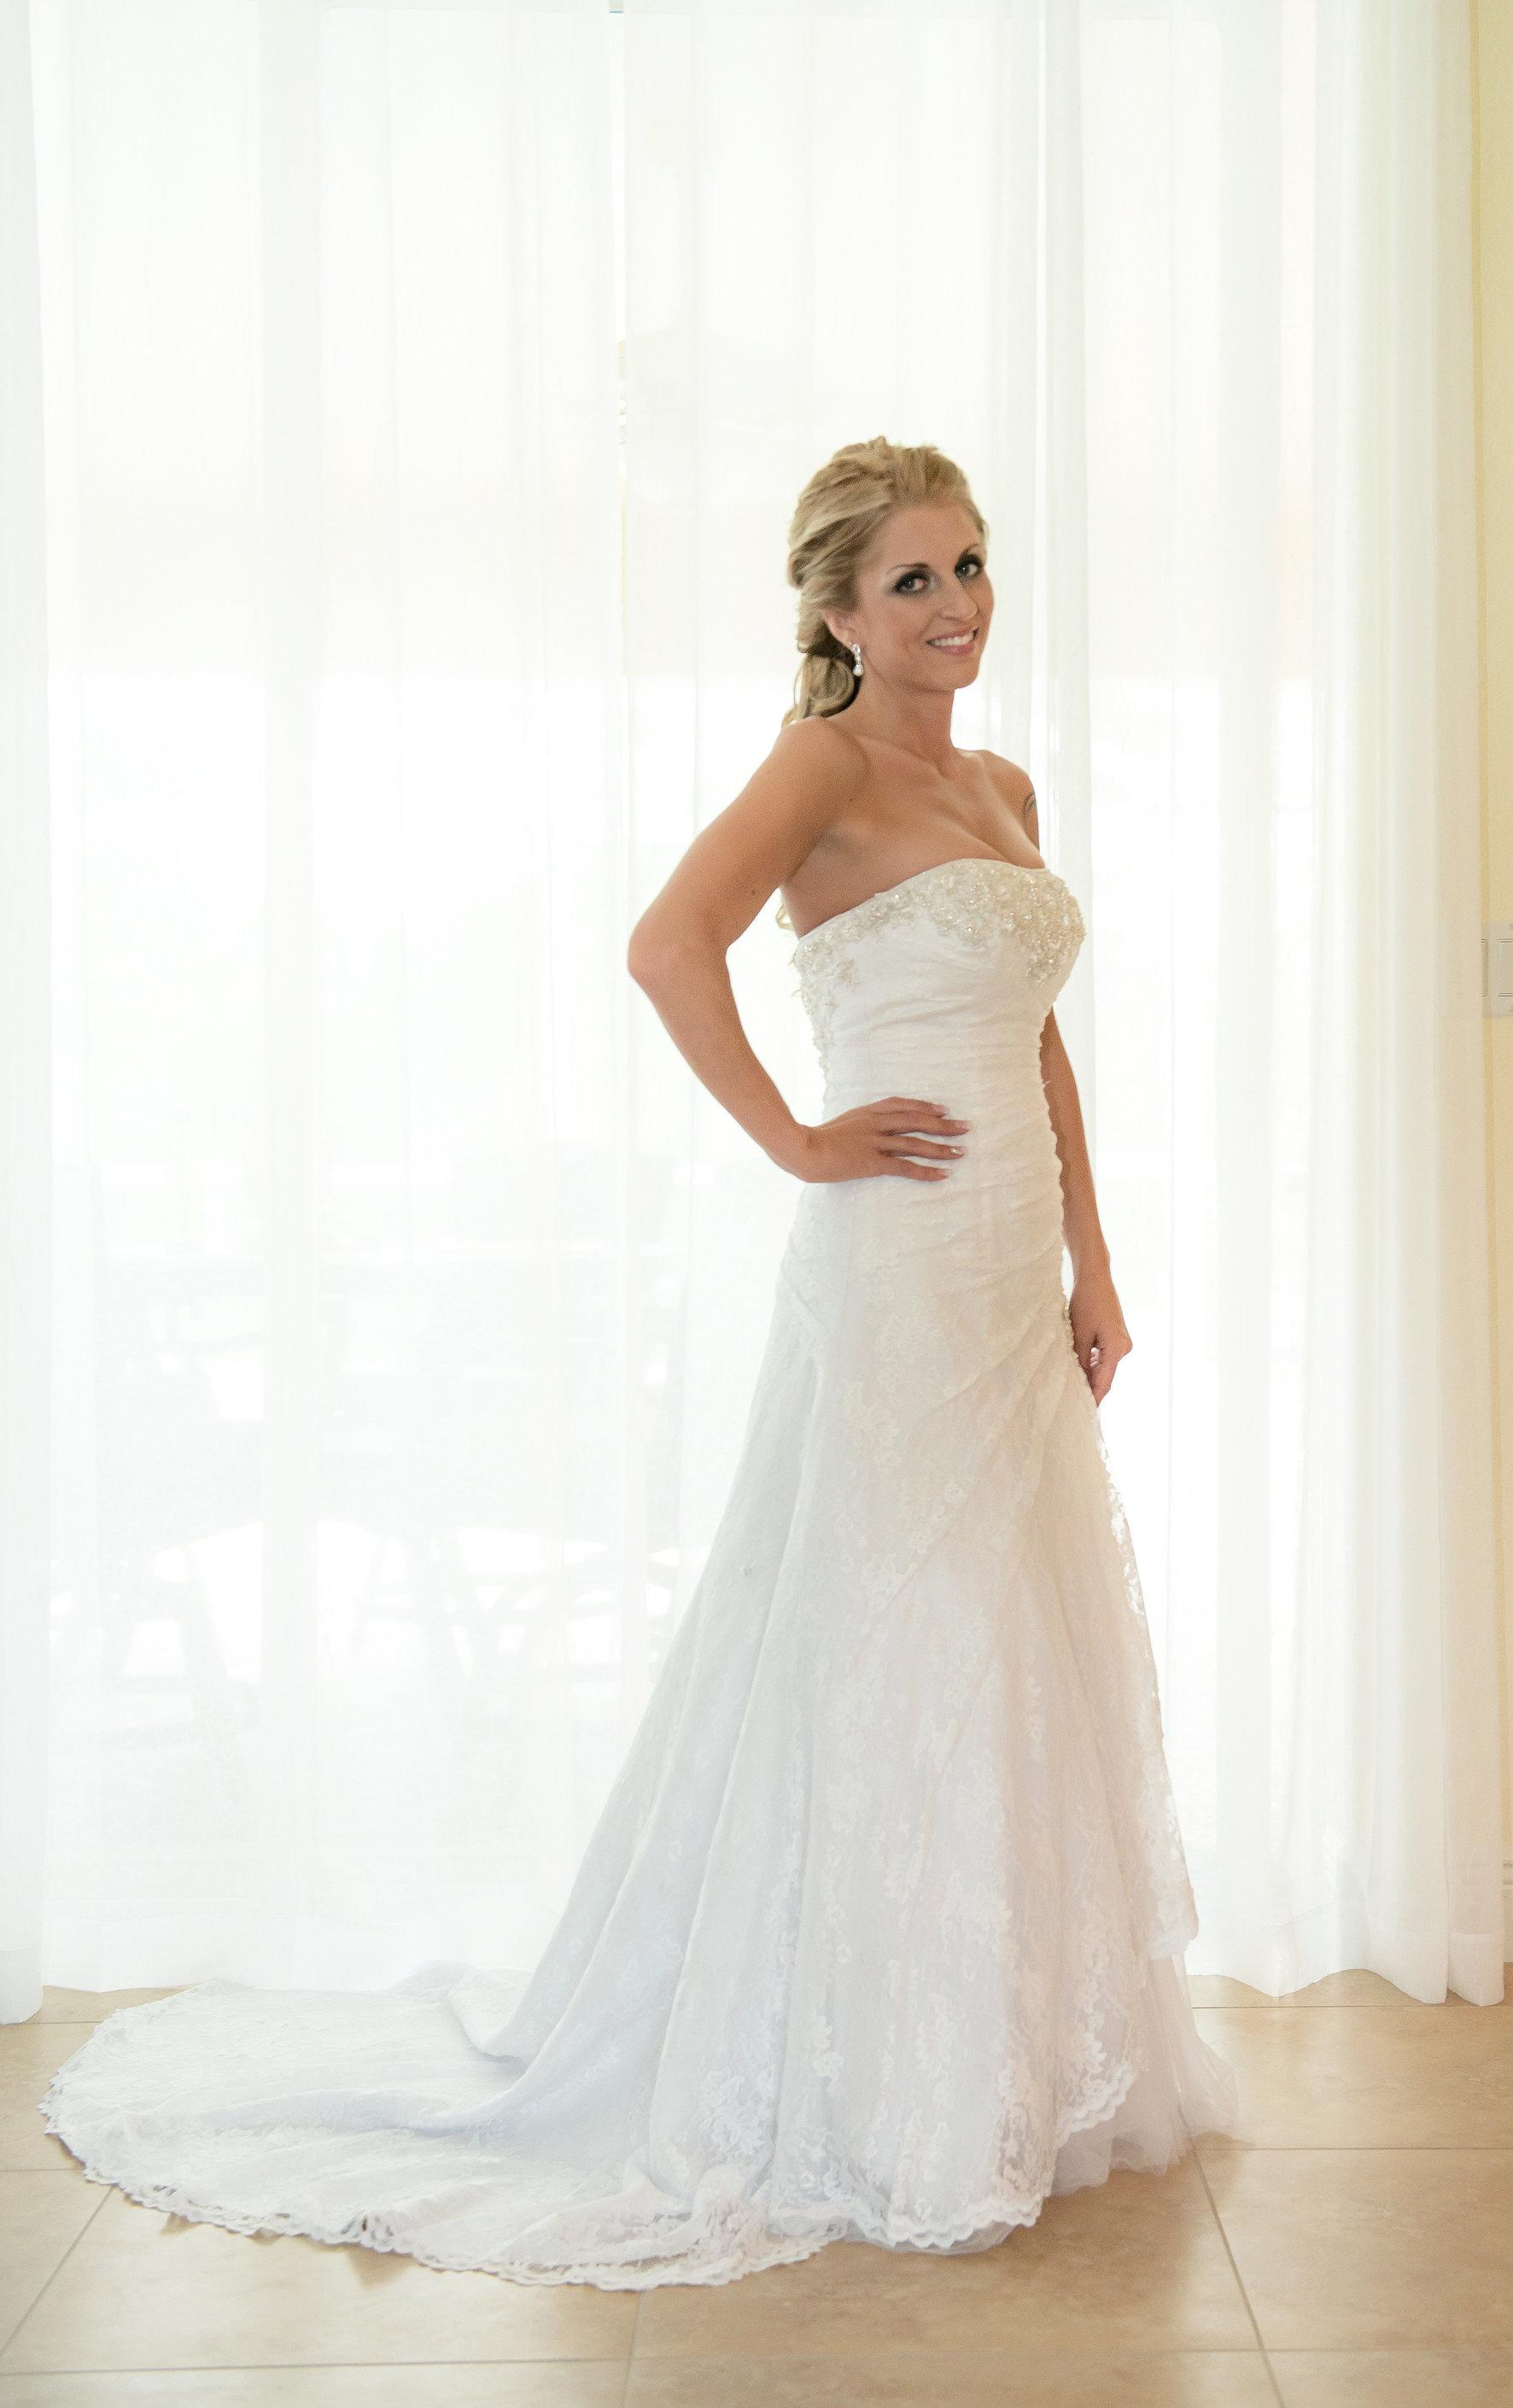 Heather Chuck s Wedding Day-Heather Chuck s Wedding Day-0055.jpg